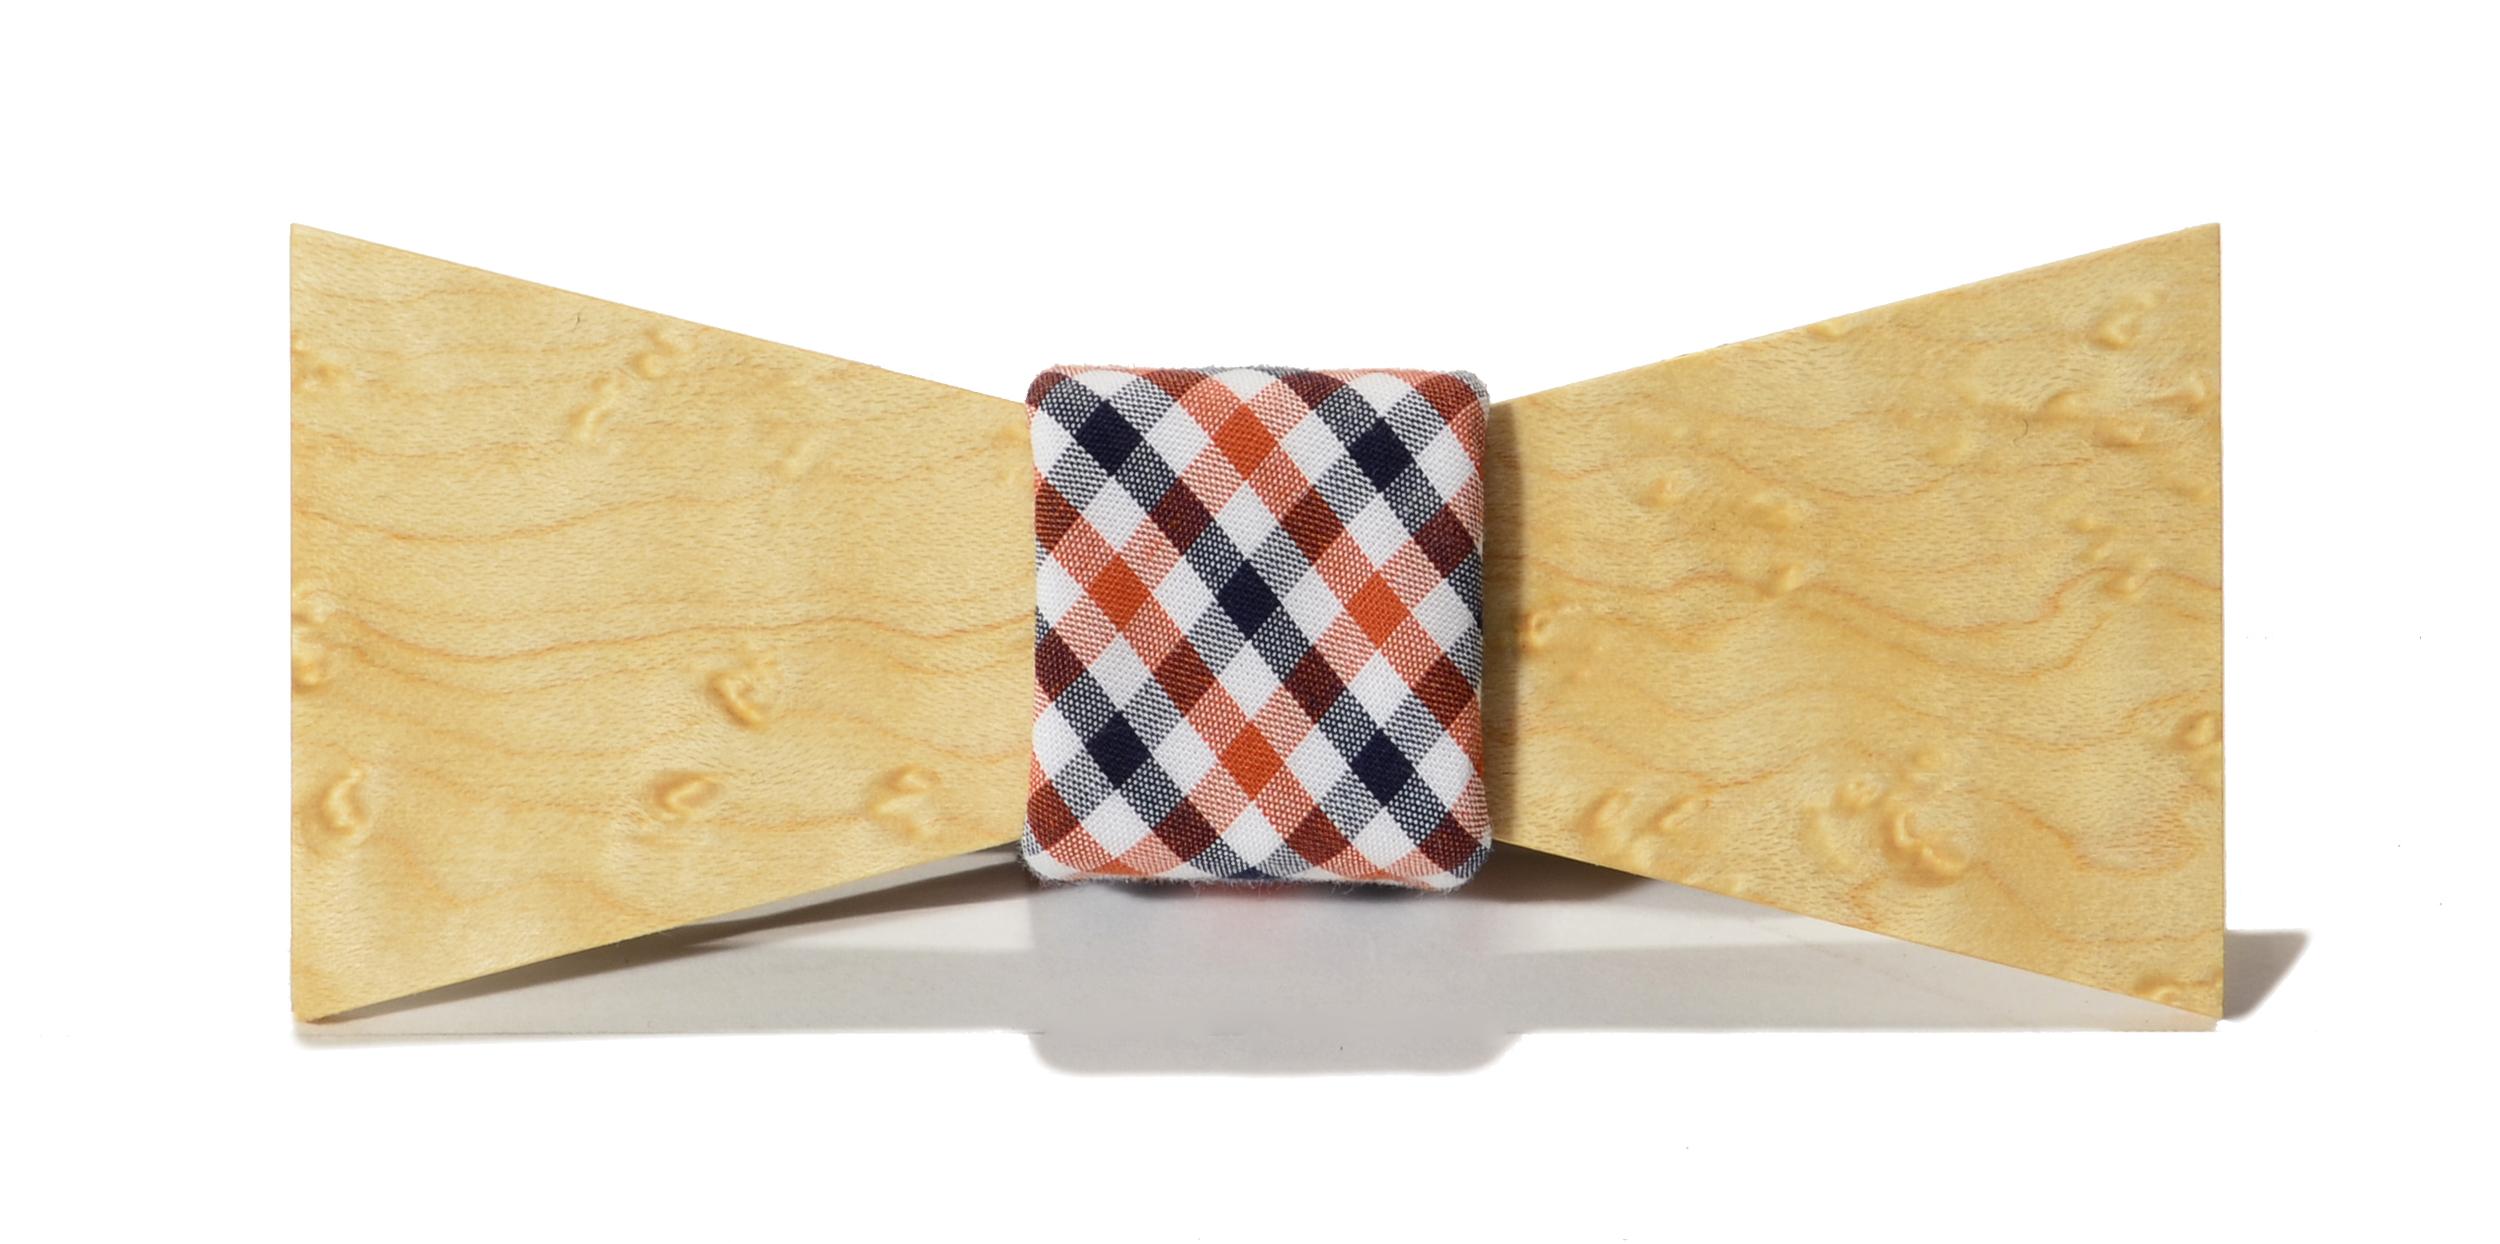 The Clark Birdseye Maple Shorty Cotton Wooden Bow Tie